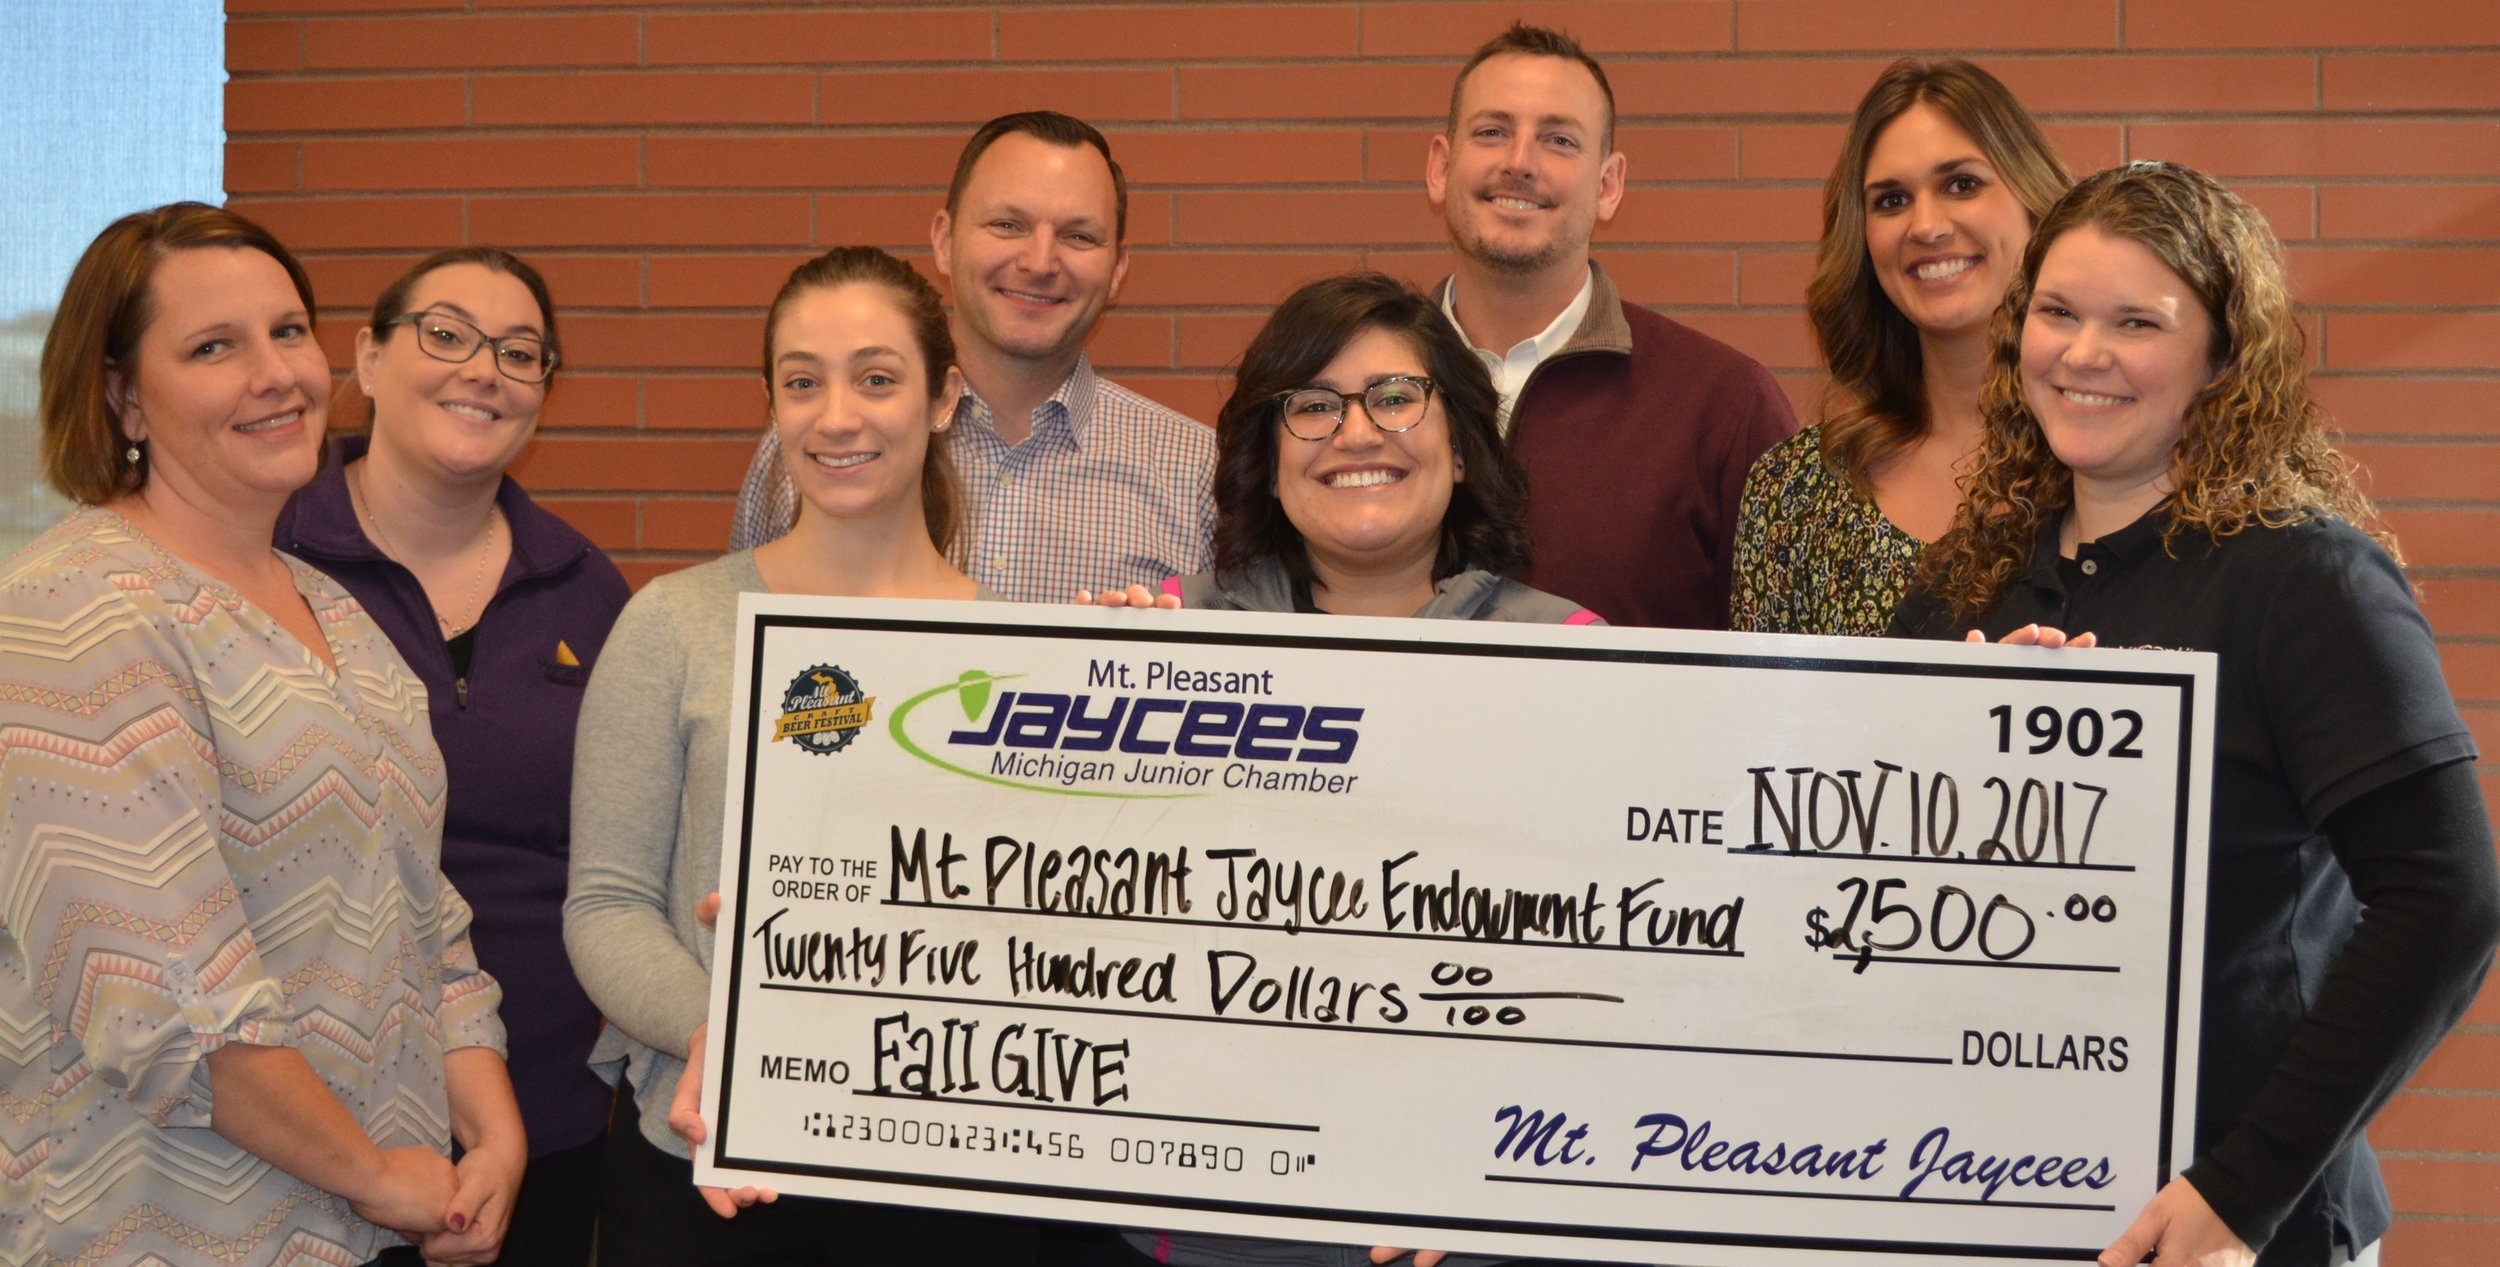 Mt. Pleasant Jaycees Endowment Fund